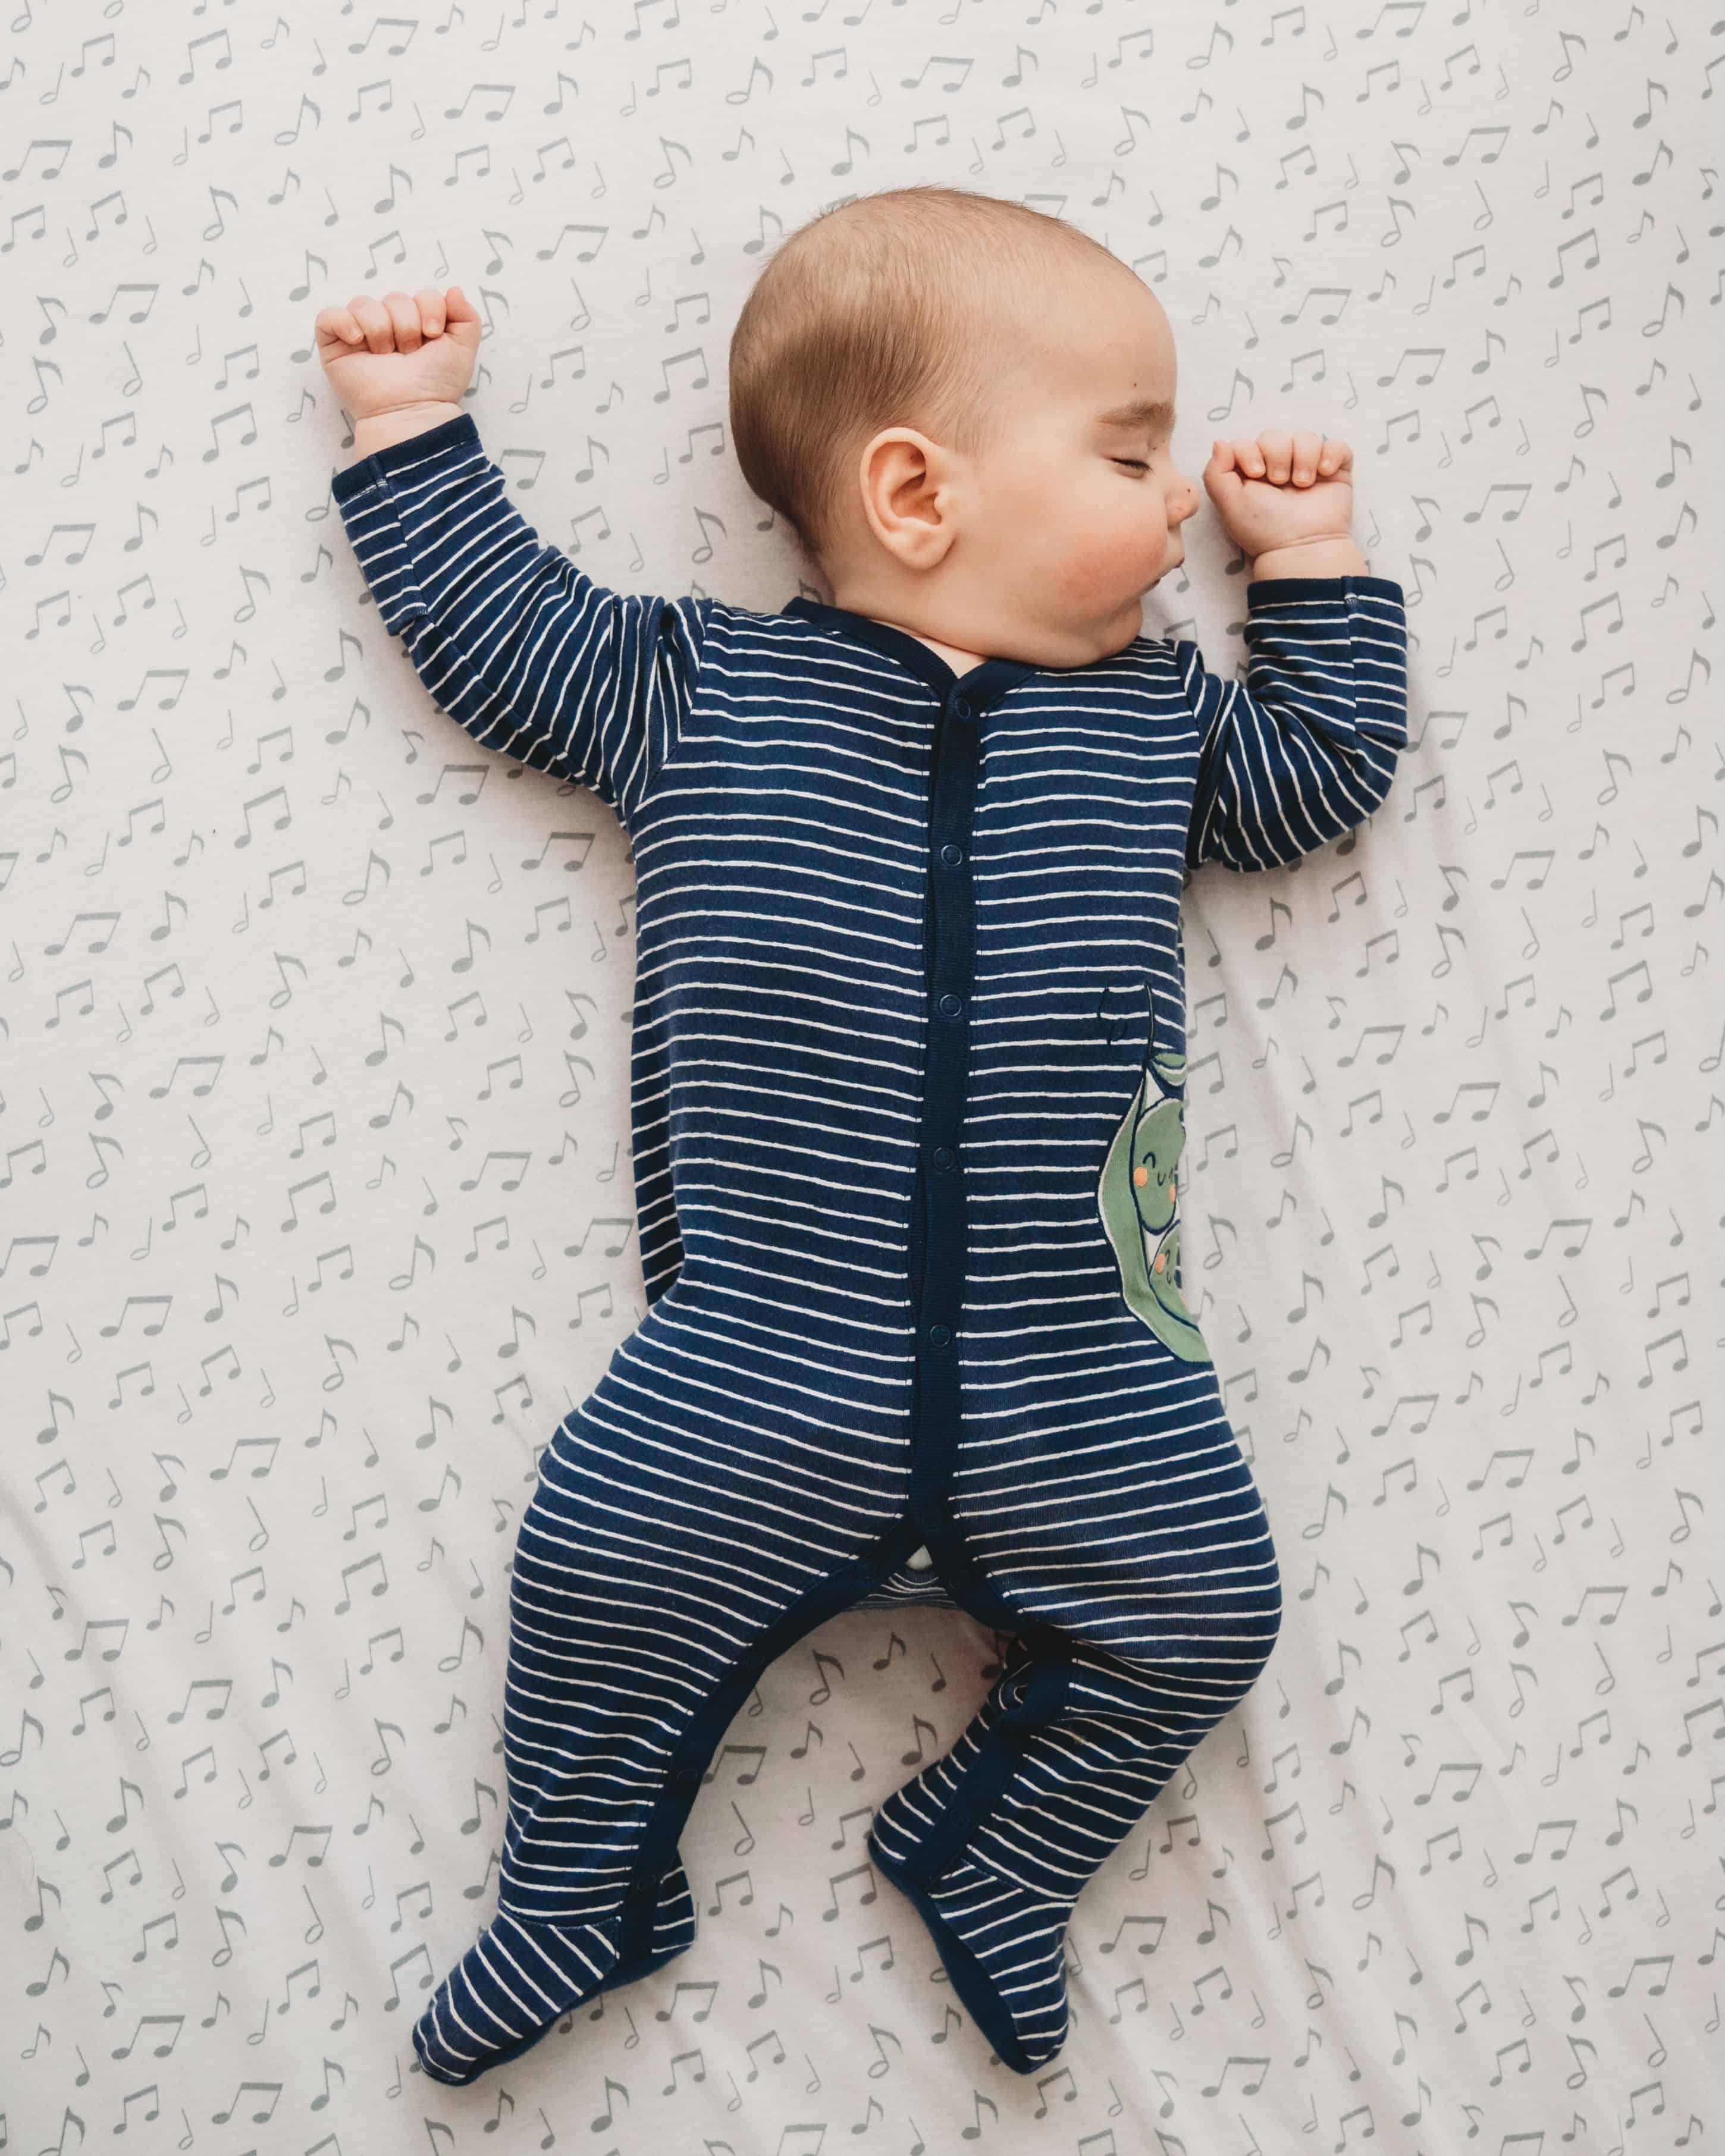 baby boy sleeping in crib